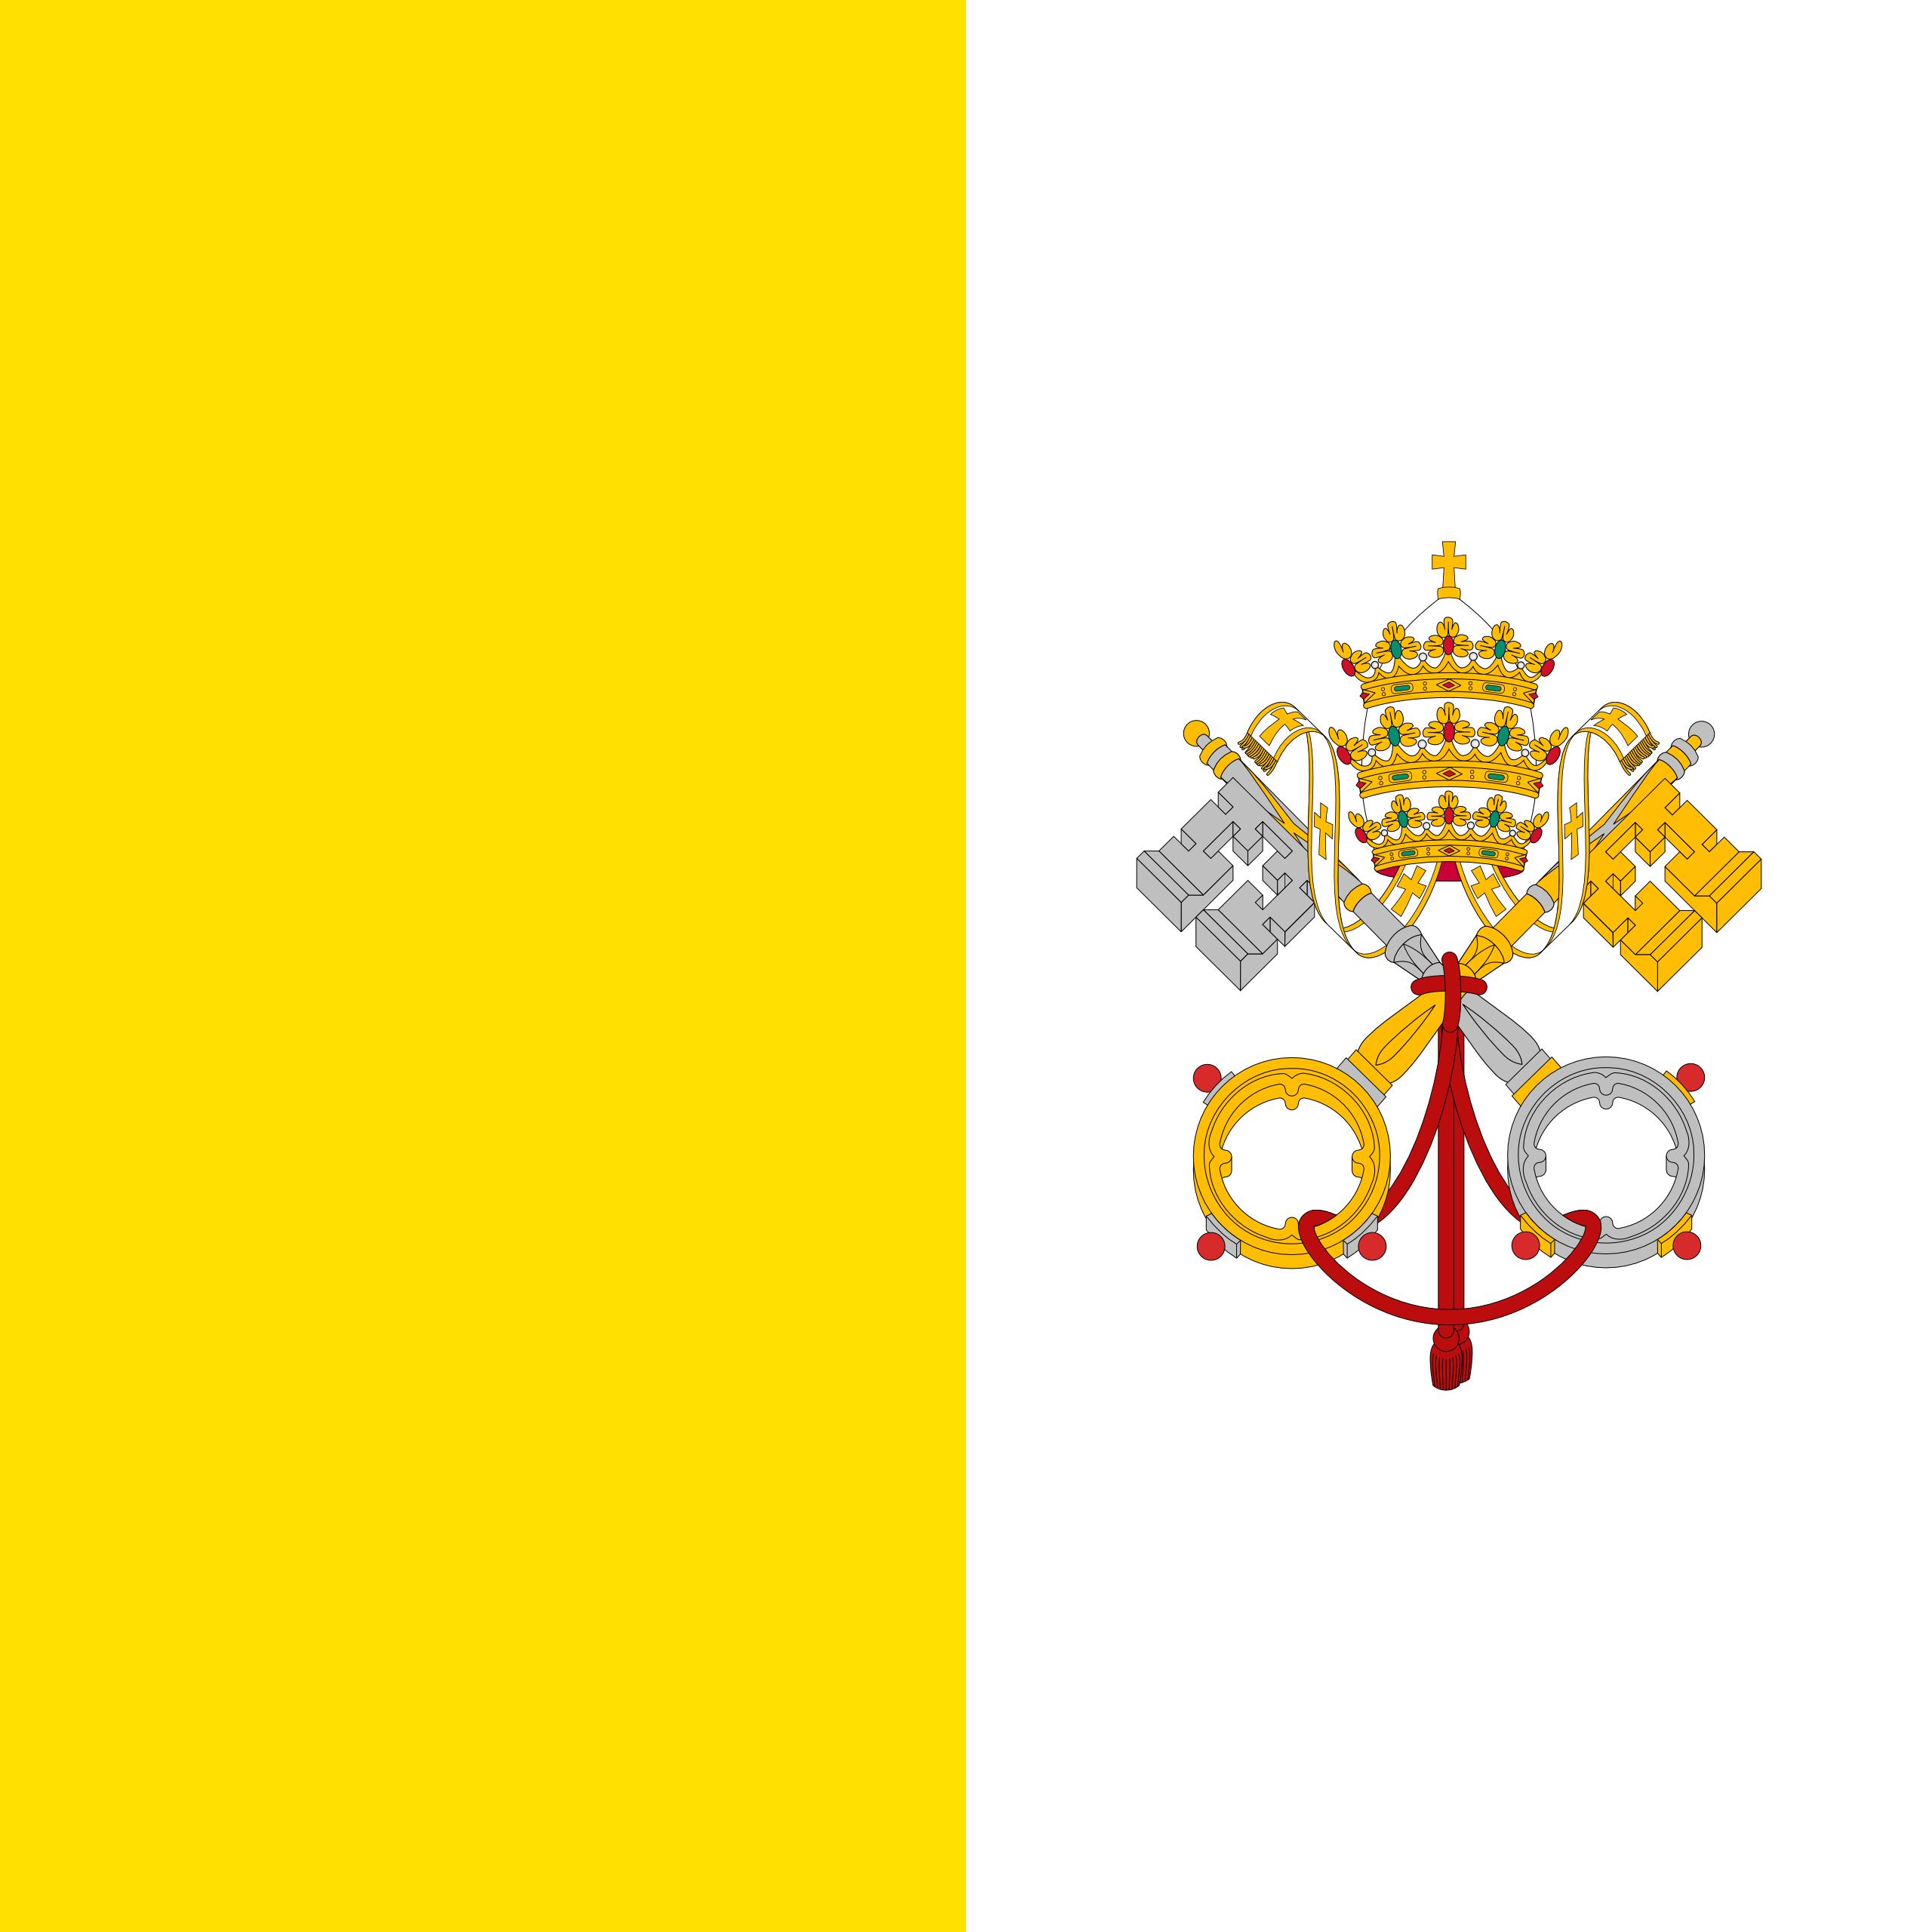 la cité du Vatican, pays, emblème, logo, symbole - Fonds d'écran HD - Professor-falken.com